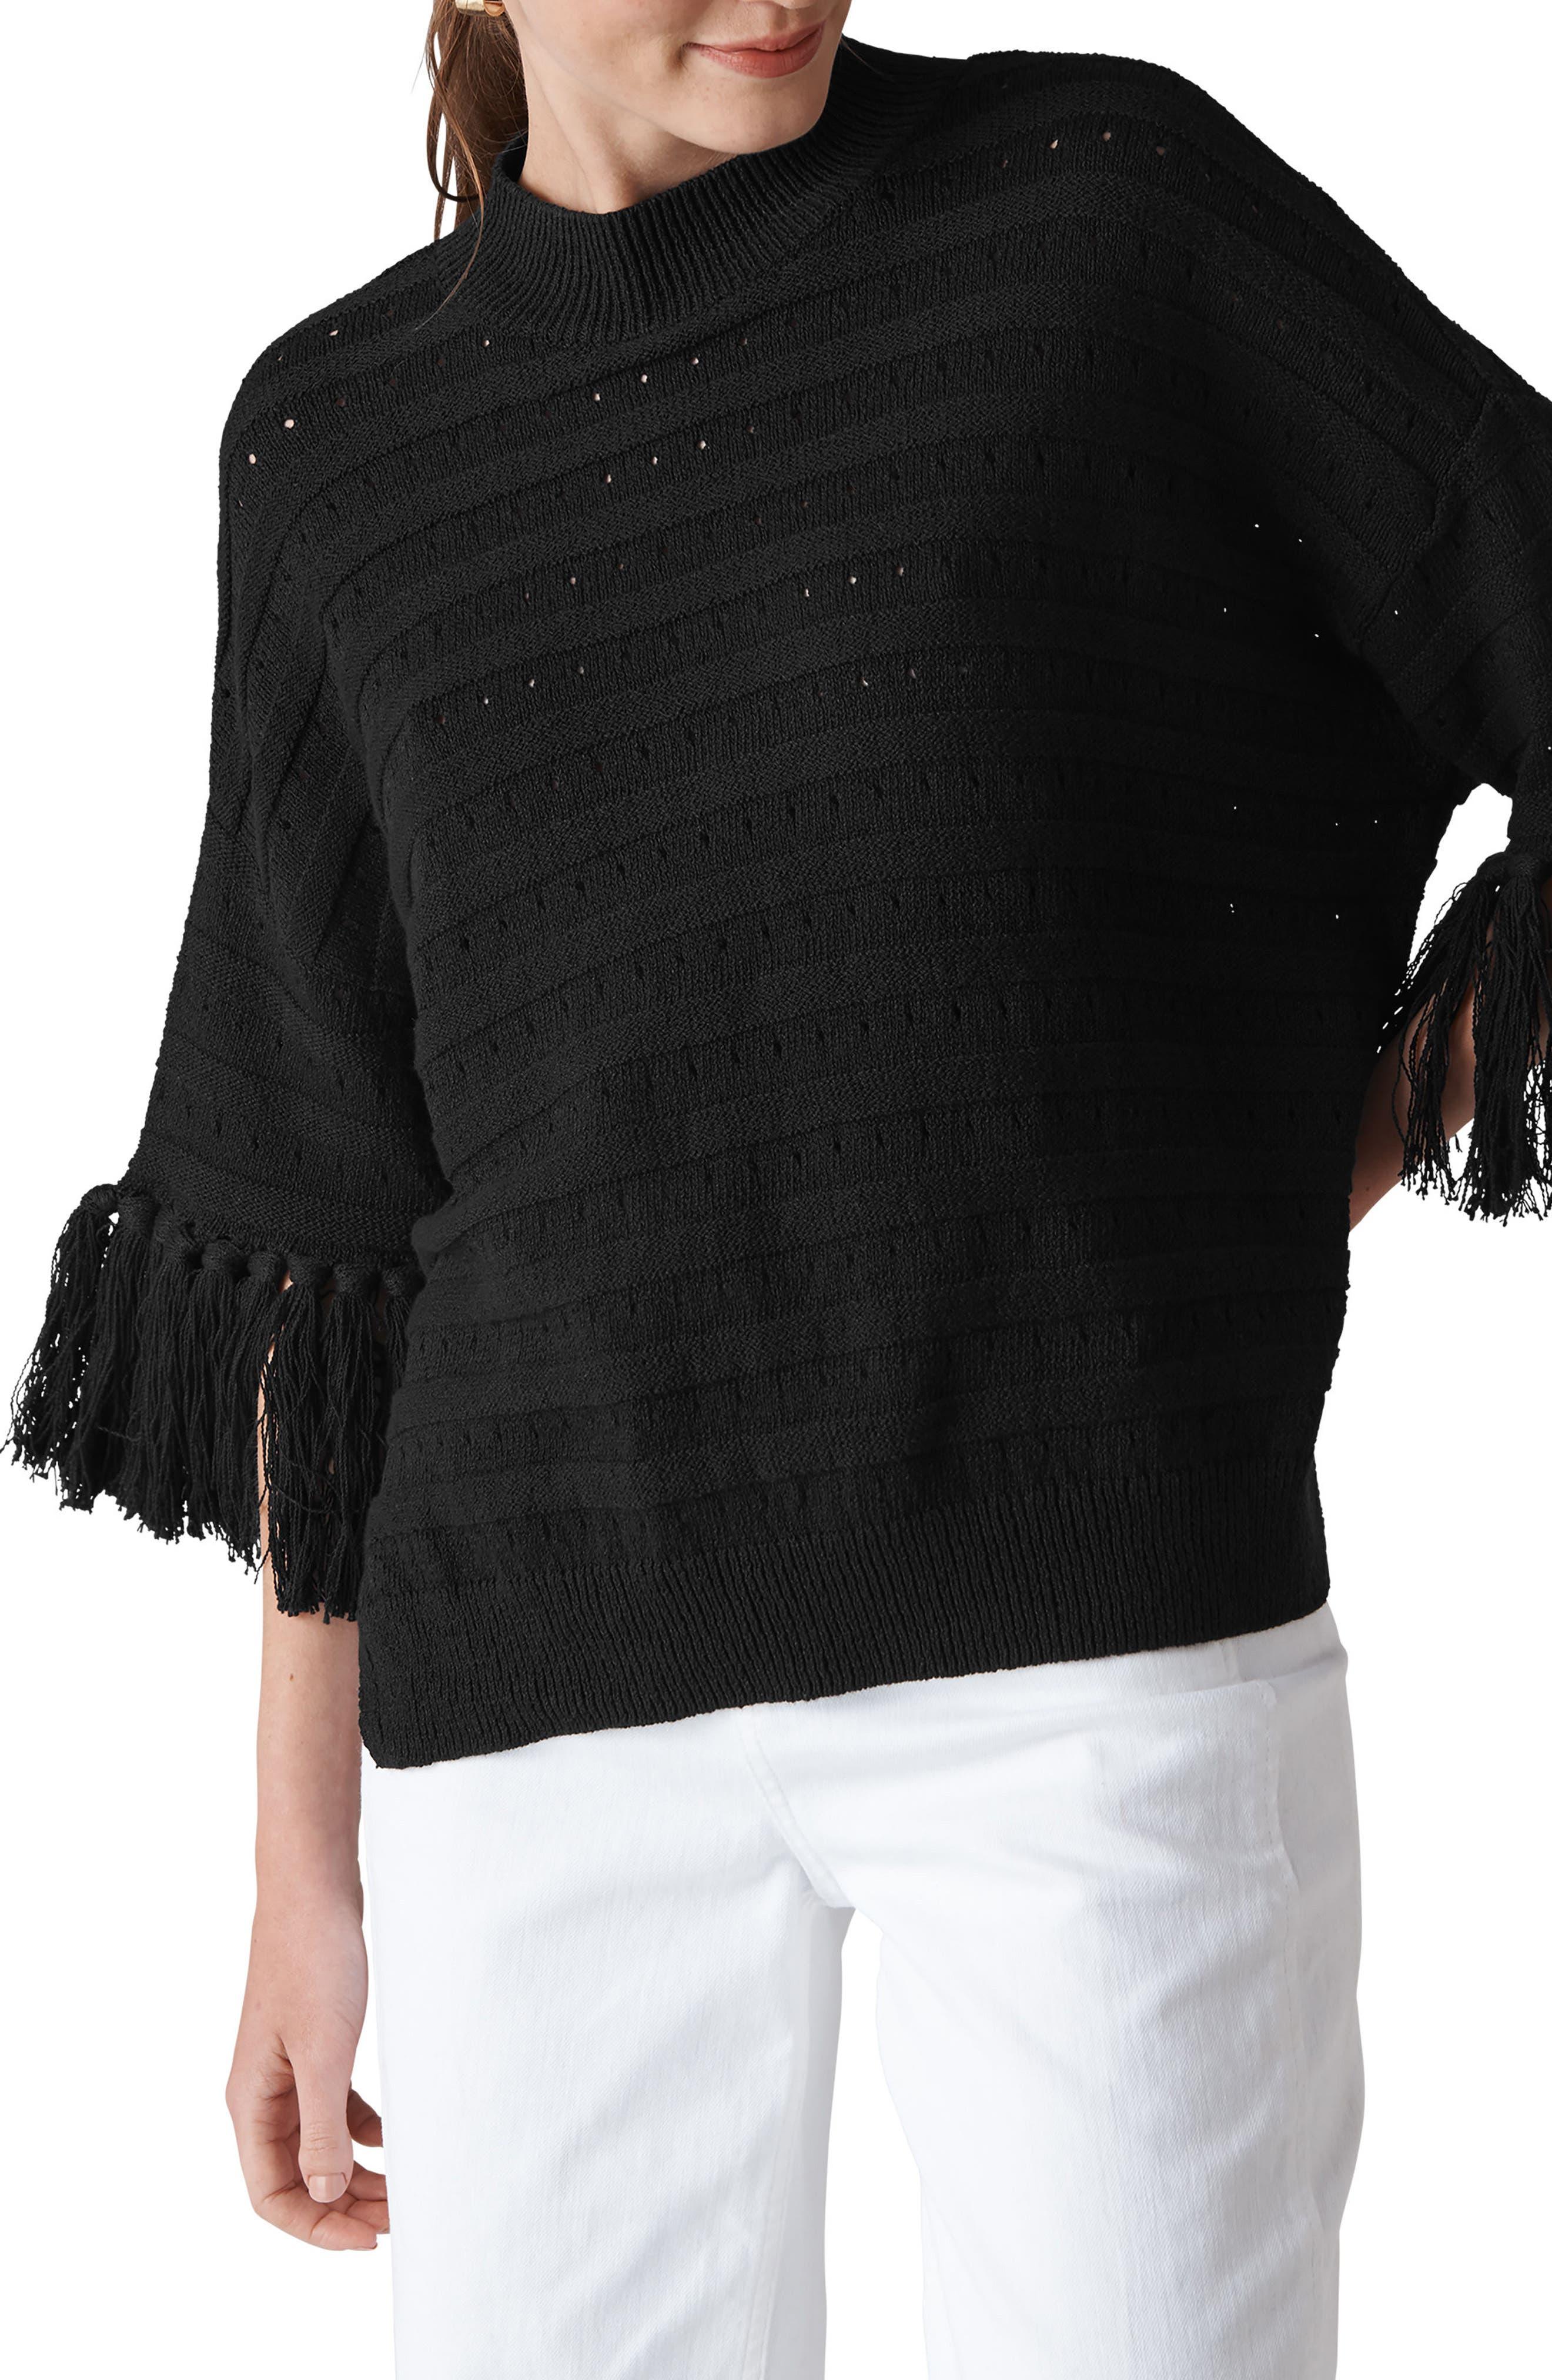 Fringe Detail Knit Top,                             Main thumbnail 1, color,                             Black